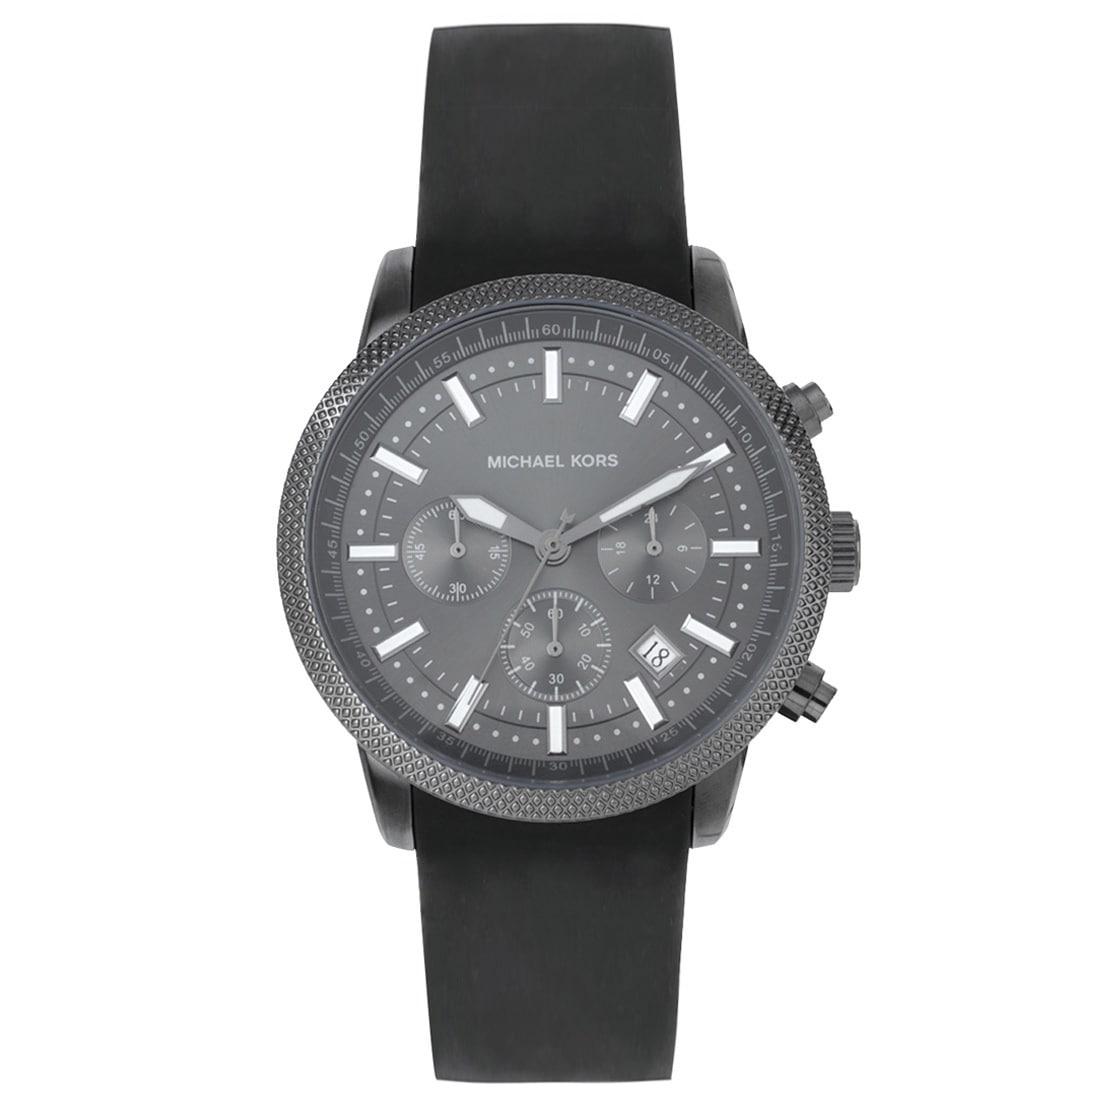 c96d1e313e4e Shop Michael Kors Men s MK8241 Scout Grey Silicone Watch - Free Shipping  Today - Overstock - 6822922